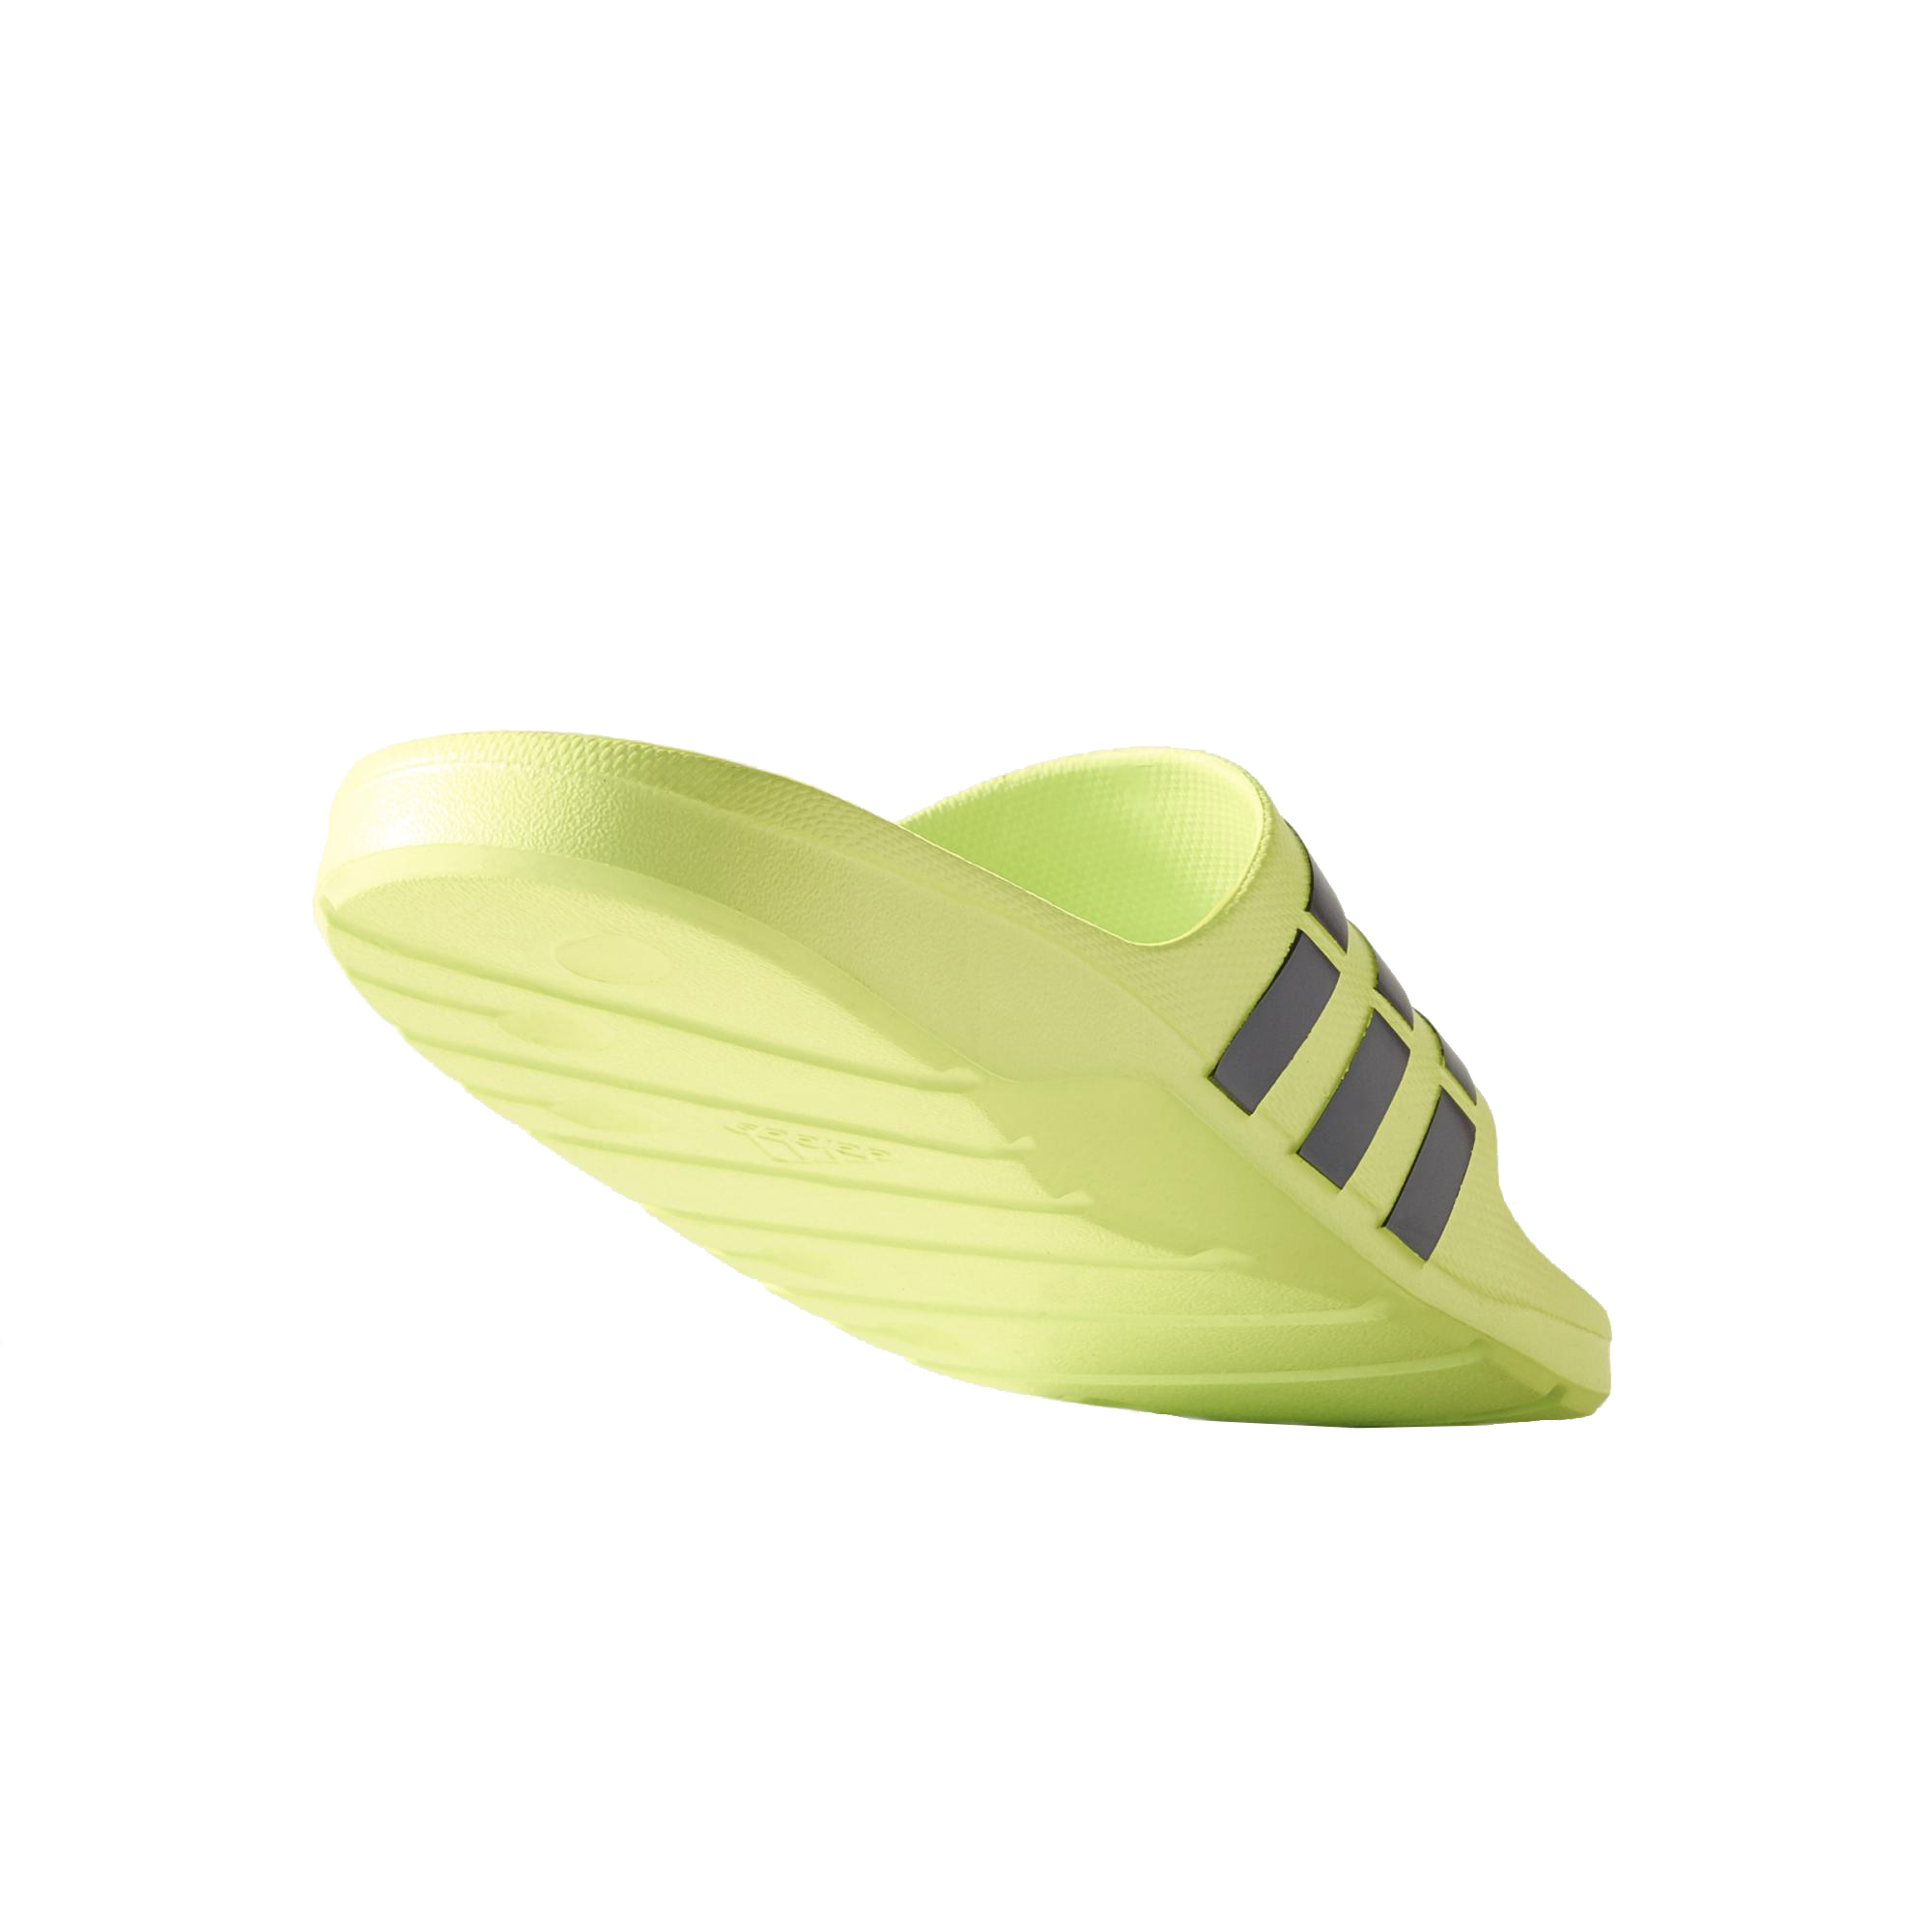 Chanclas Adidas Adidas Chanclas Slideamarillosolarmarino Adidas Duramo Duramo Slideamarillosolarmarino Chanclas Duramo 543RjAL